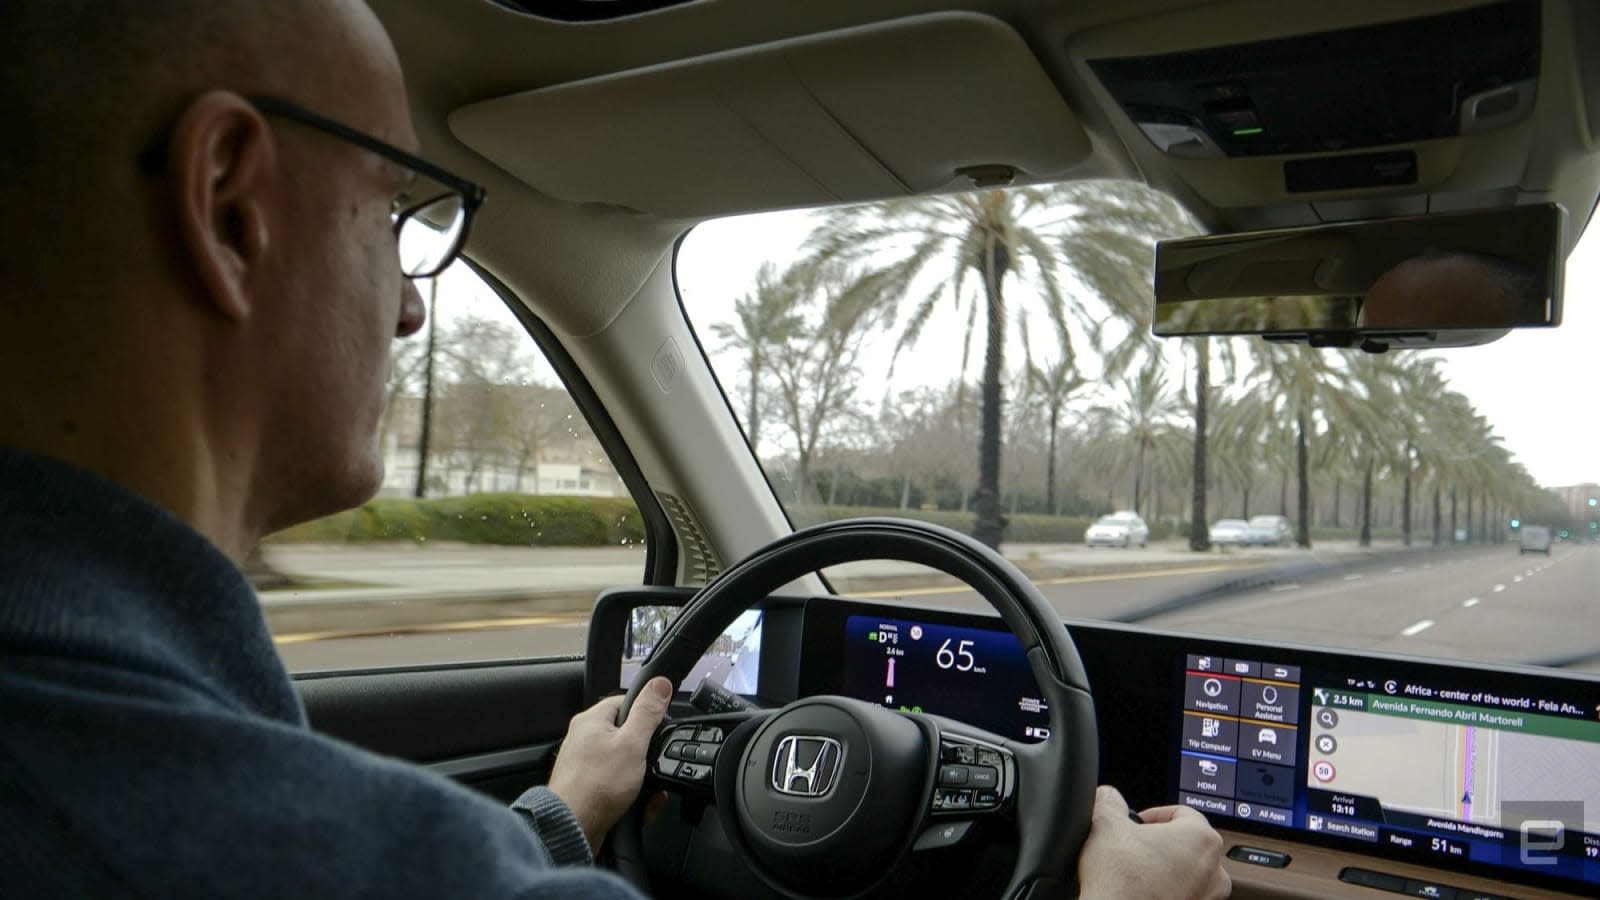 Honda E electric car first look